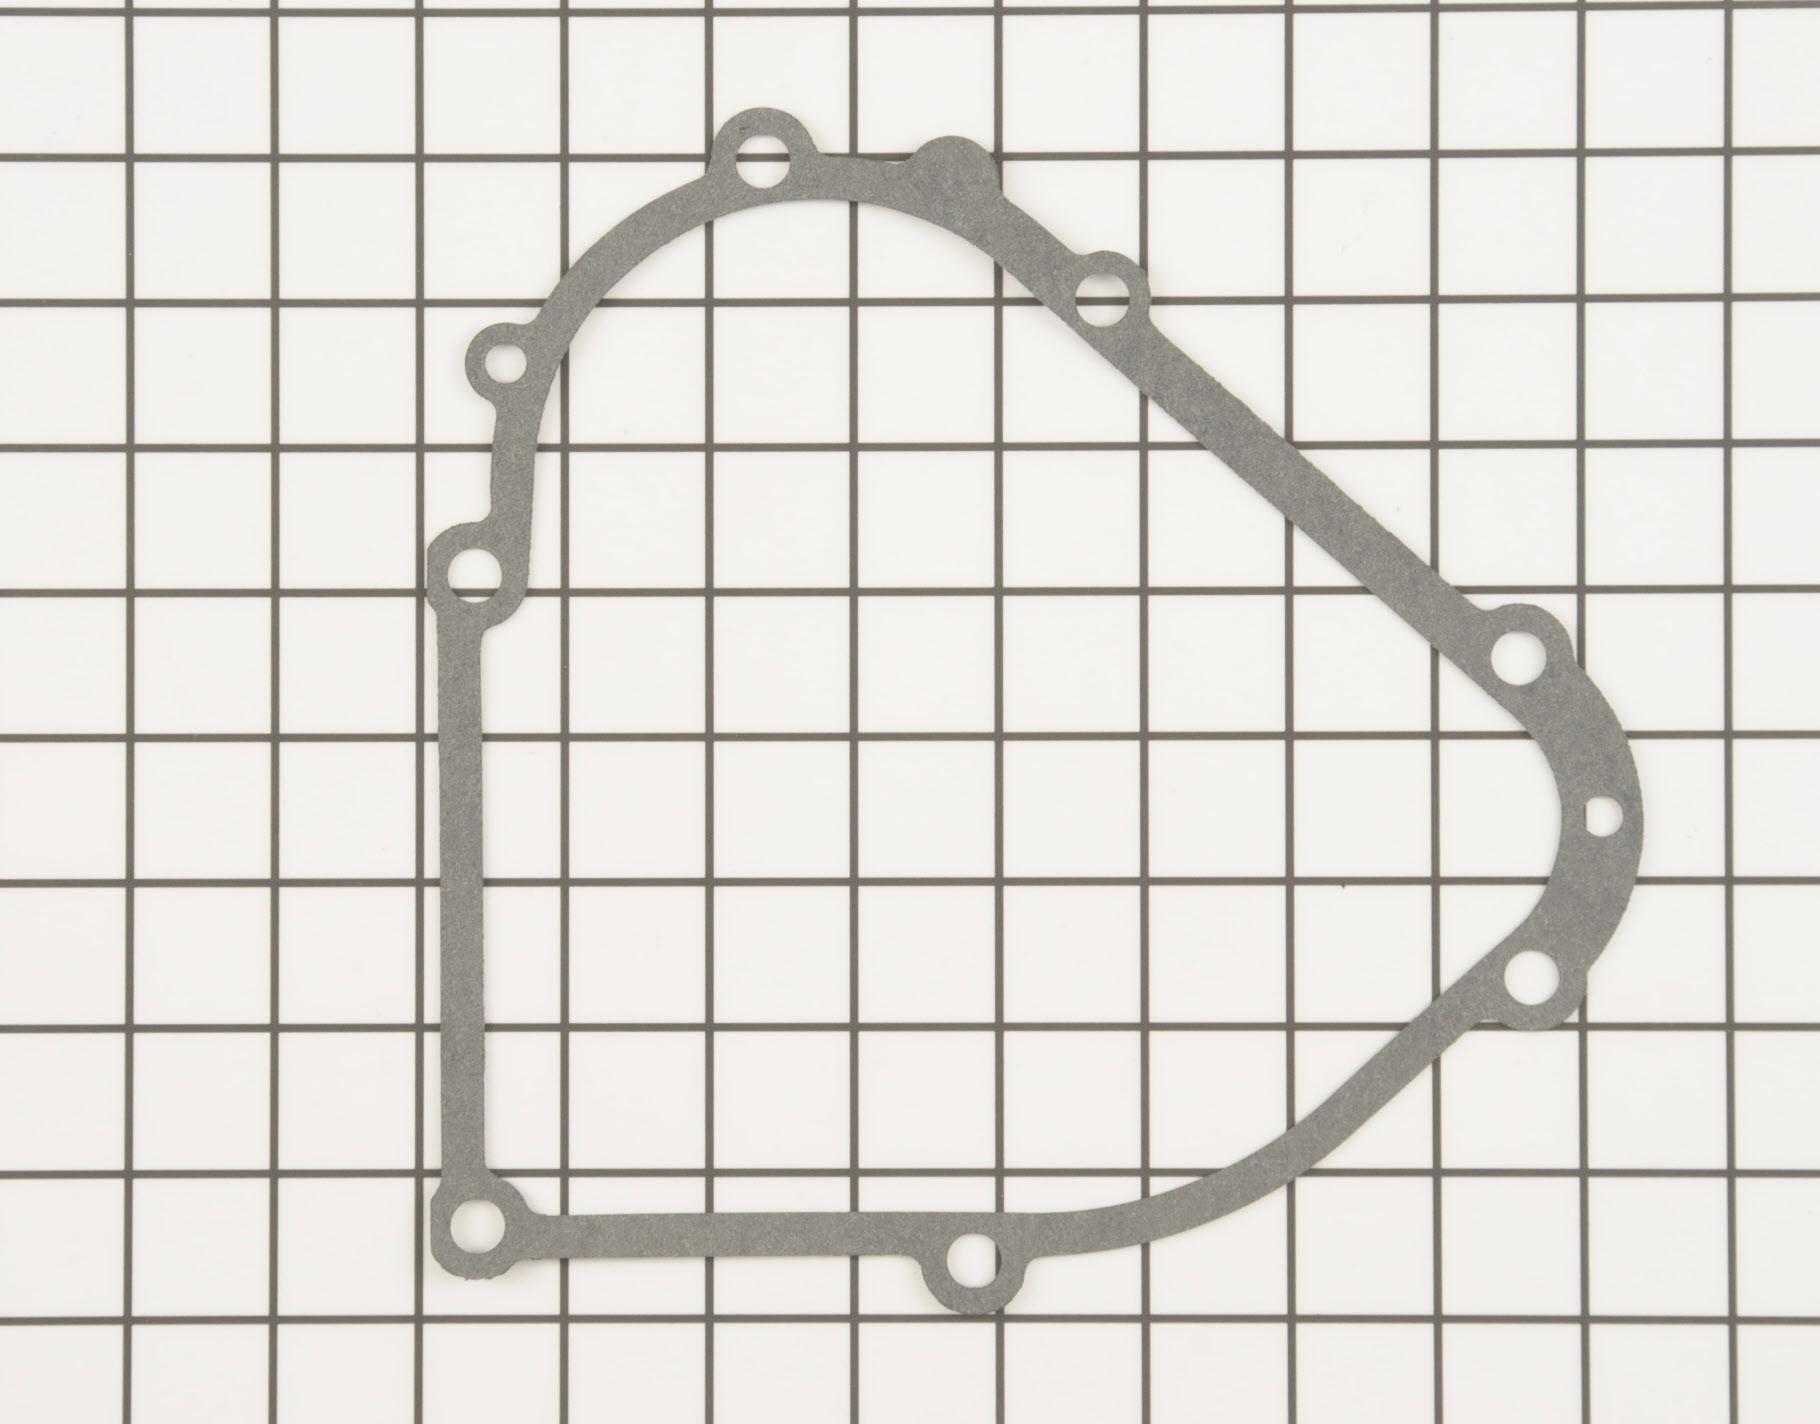 Simplicity Lawn Mower Part # 694953 - Crankcase Gasket